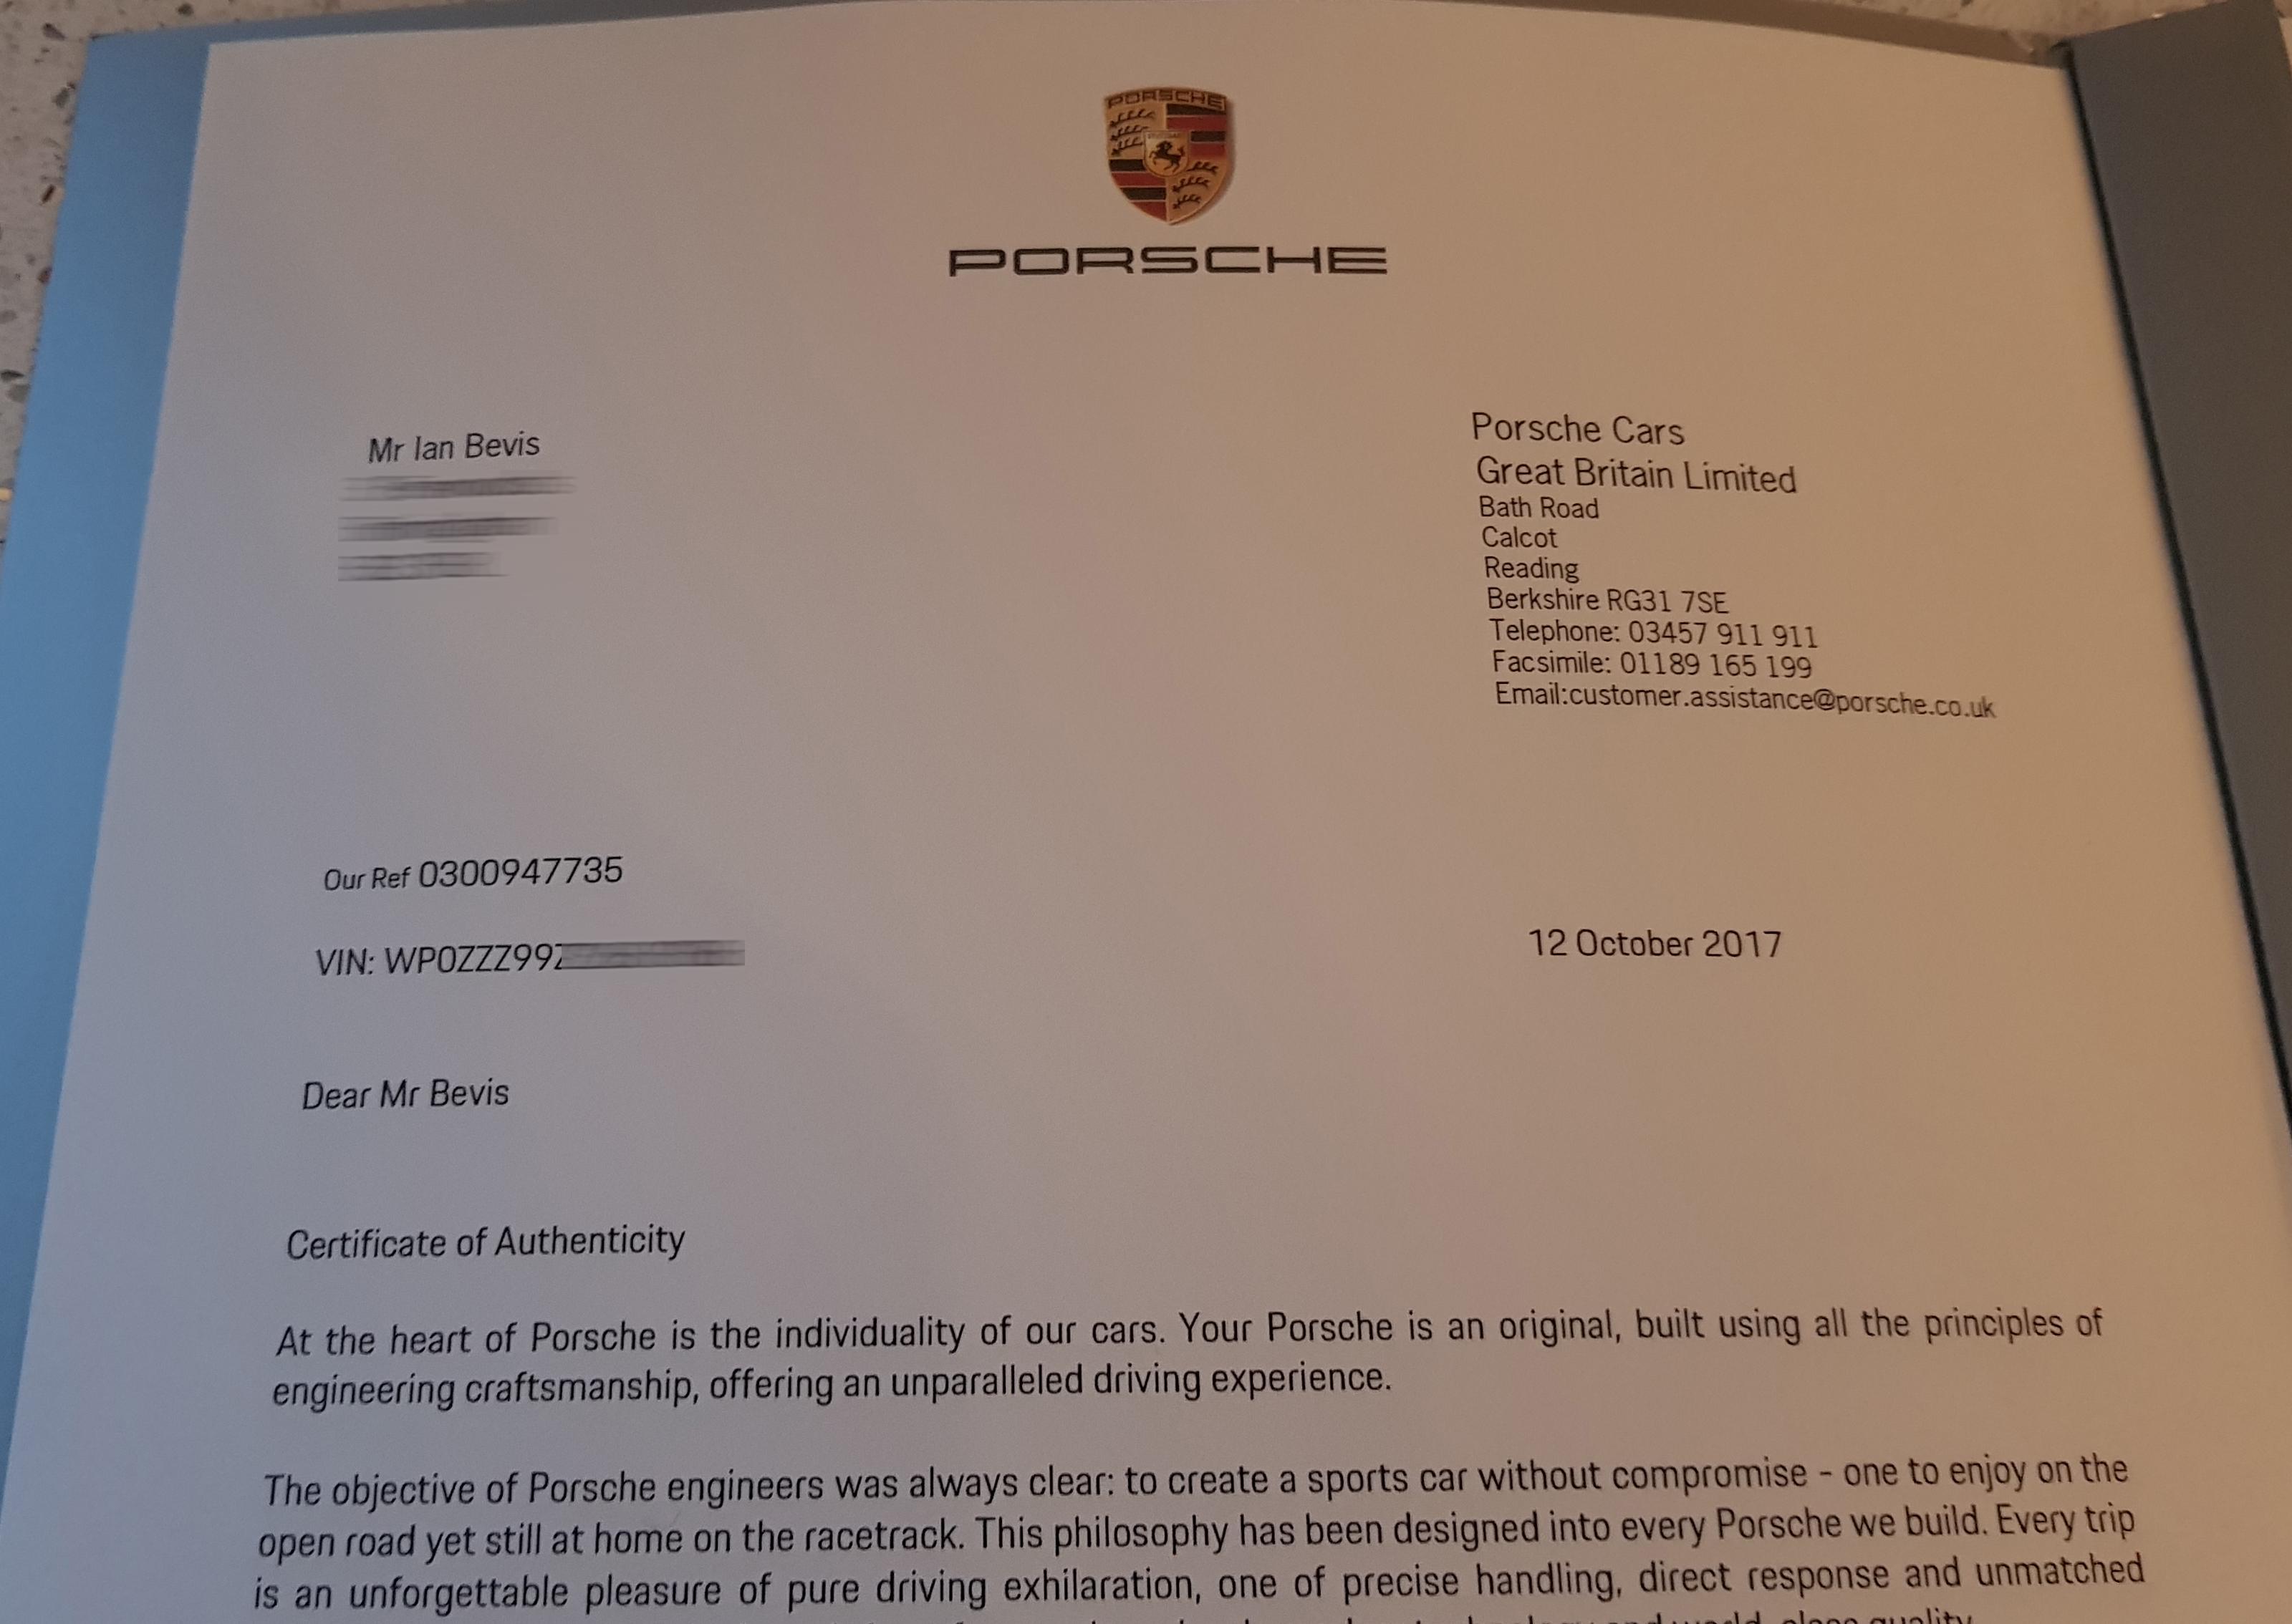 certificate authenticity porsche